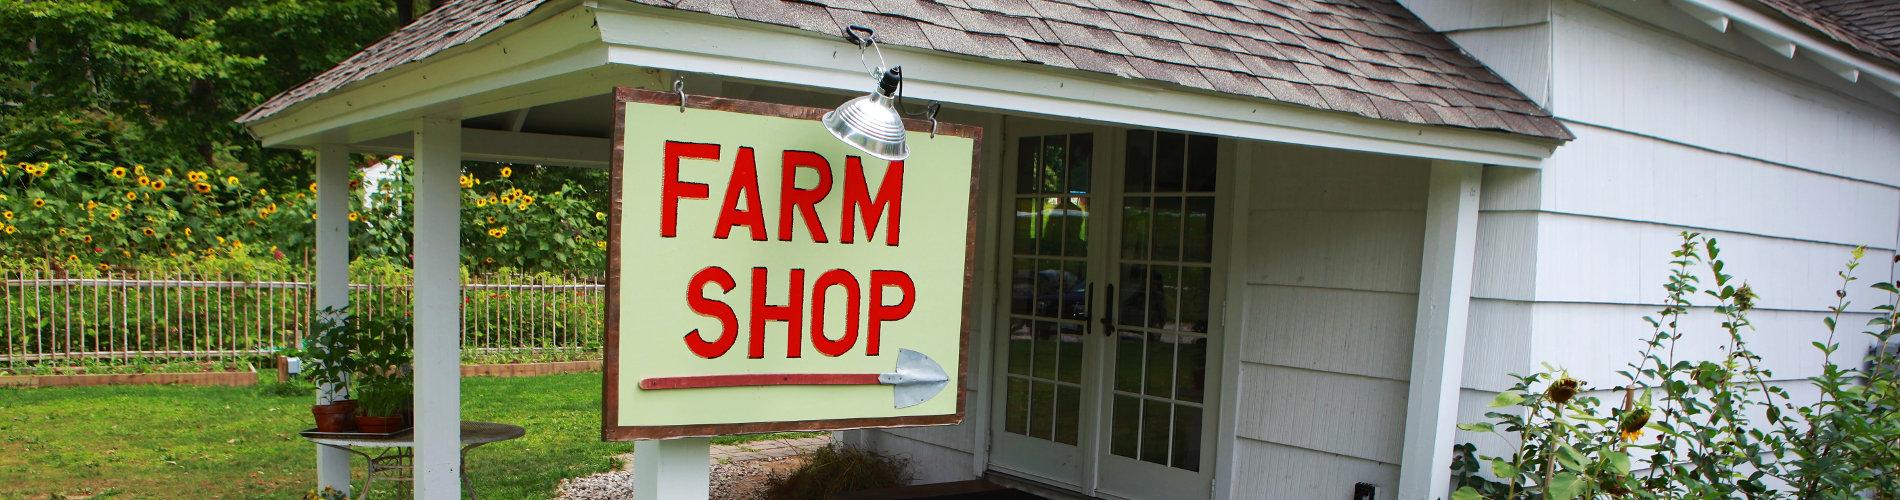 Purdy's Farm Shop Sign